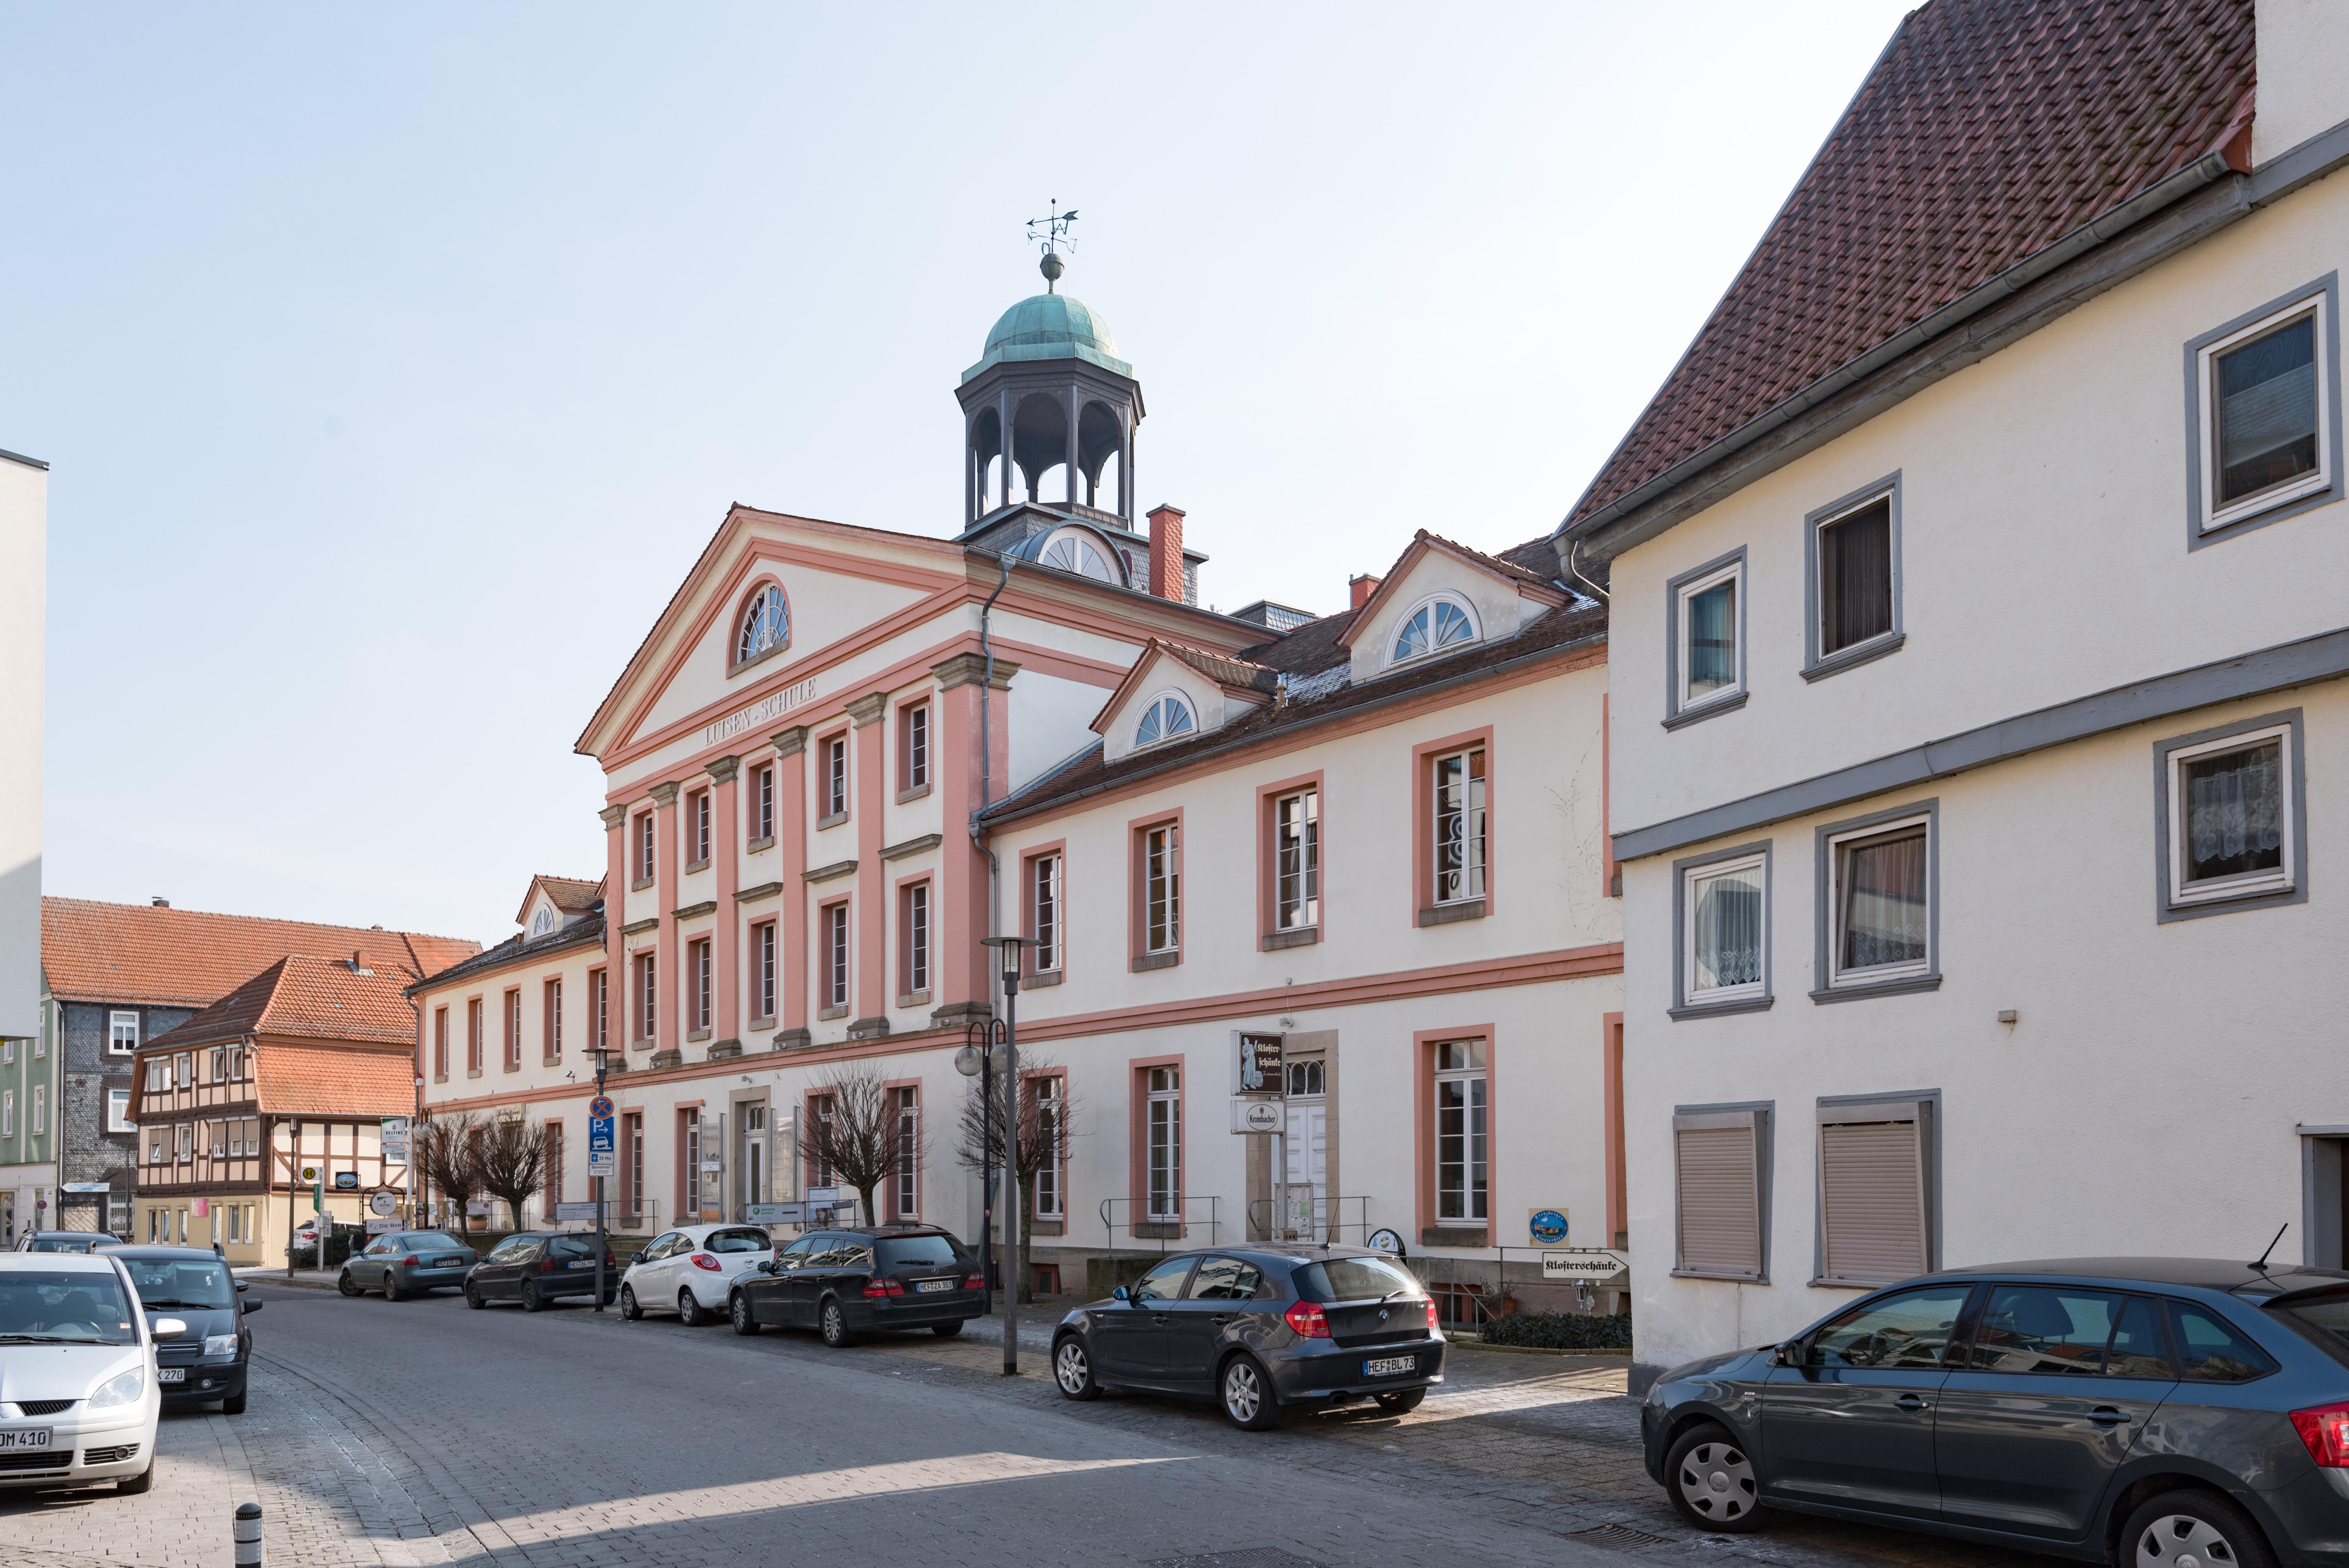 Datei:Neumarkt 11 Bad Hersfeld 20180302 001.jpg – Wikipedia